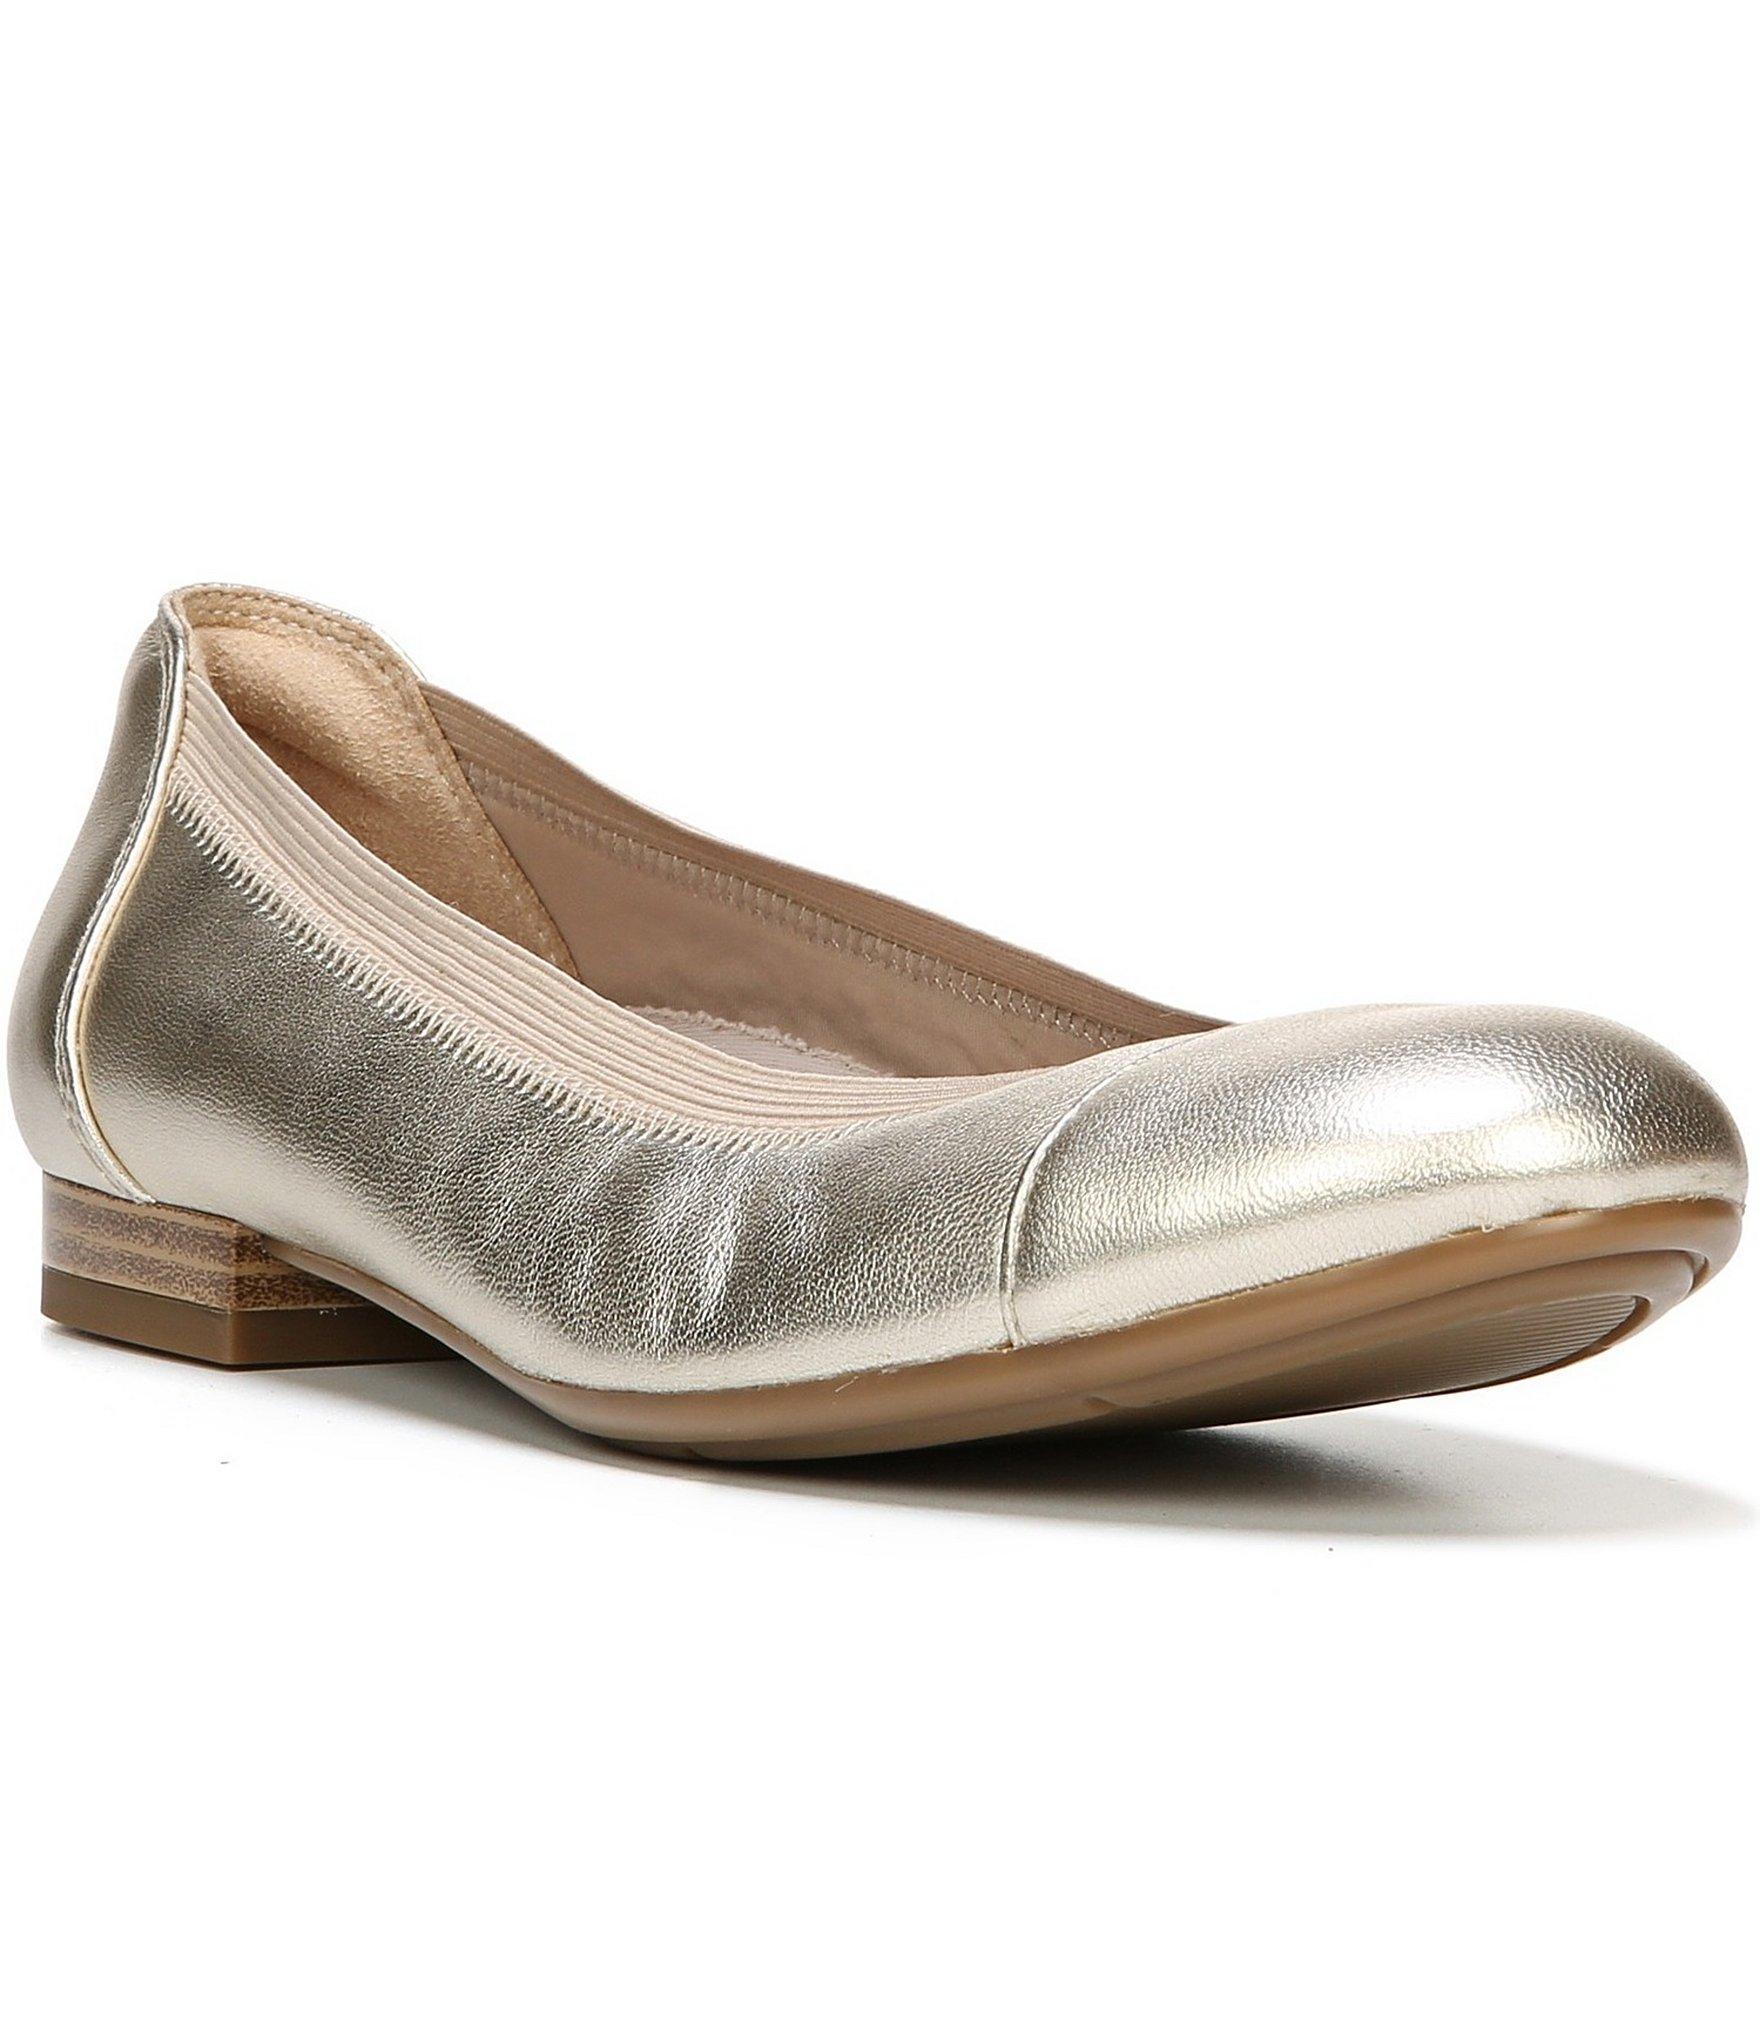 Enzo Angiolini Shoes Australia